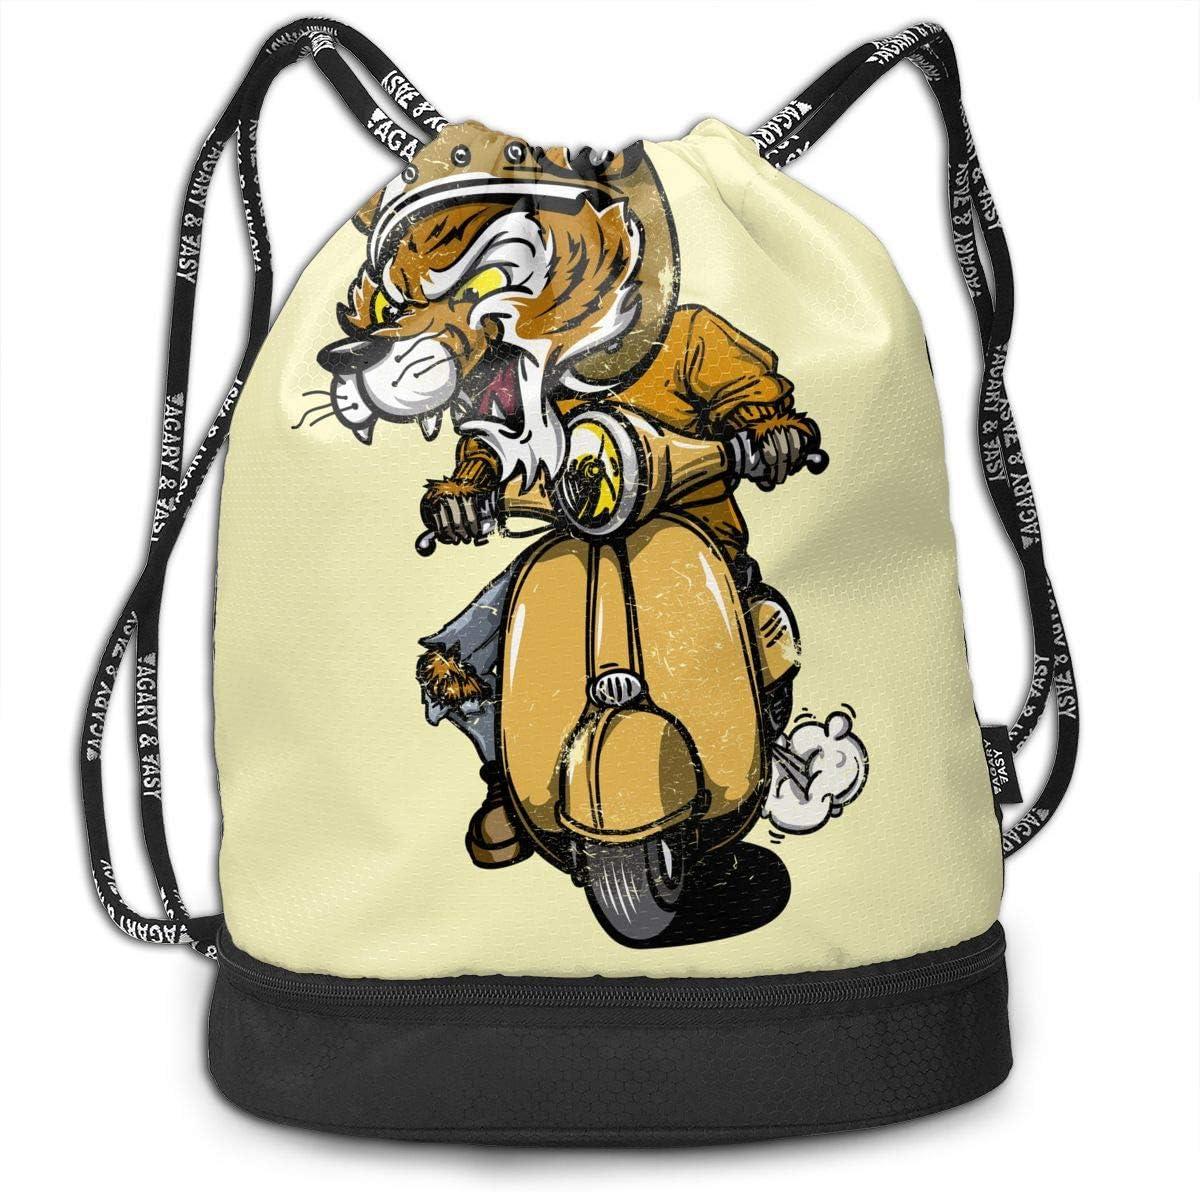 Zol1Q Lightweight Waterproof Large Storage Drawstring Bag for Men /& Women Riding Tiger Cinch Backpack Sackpack Tote Sack